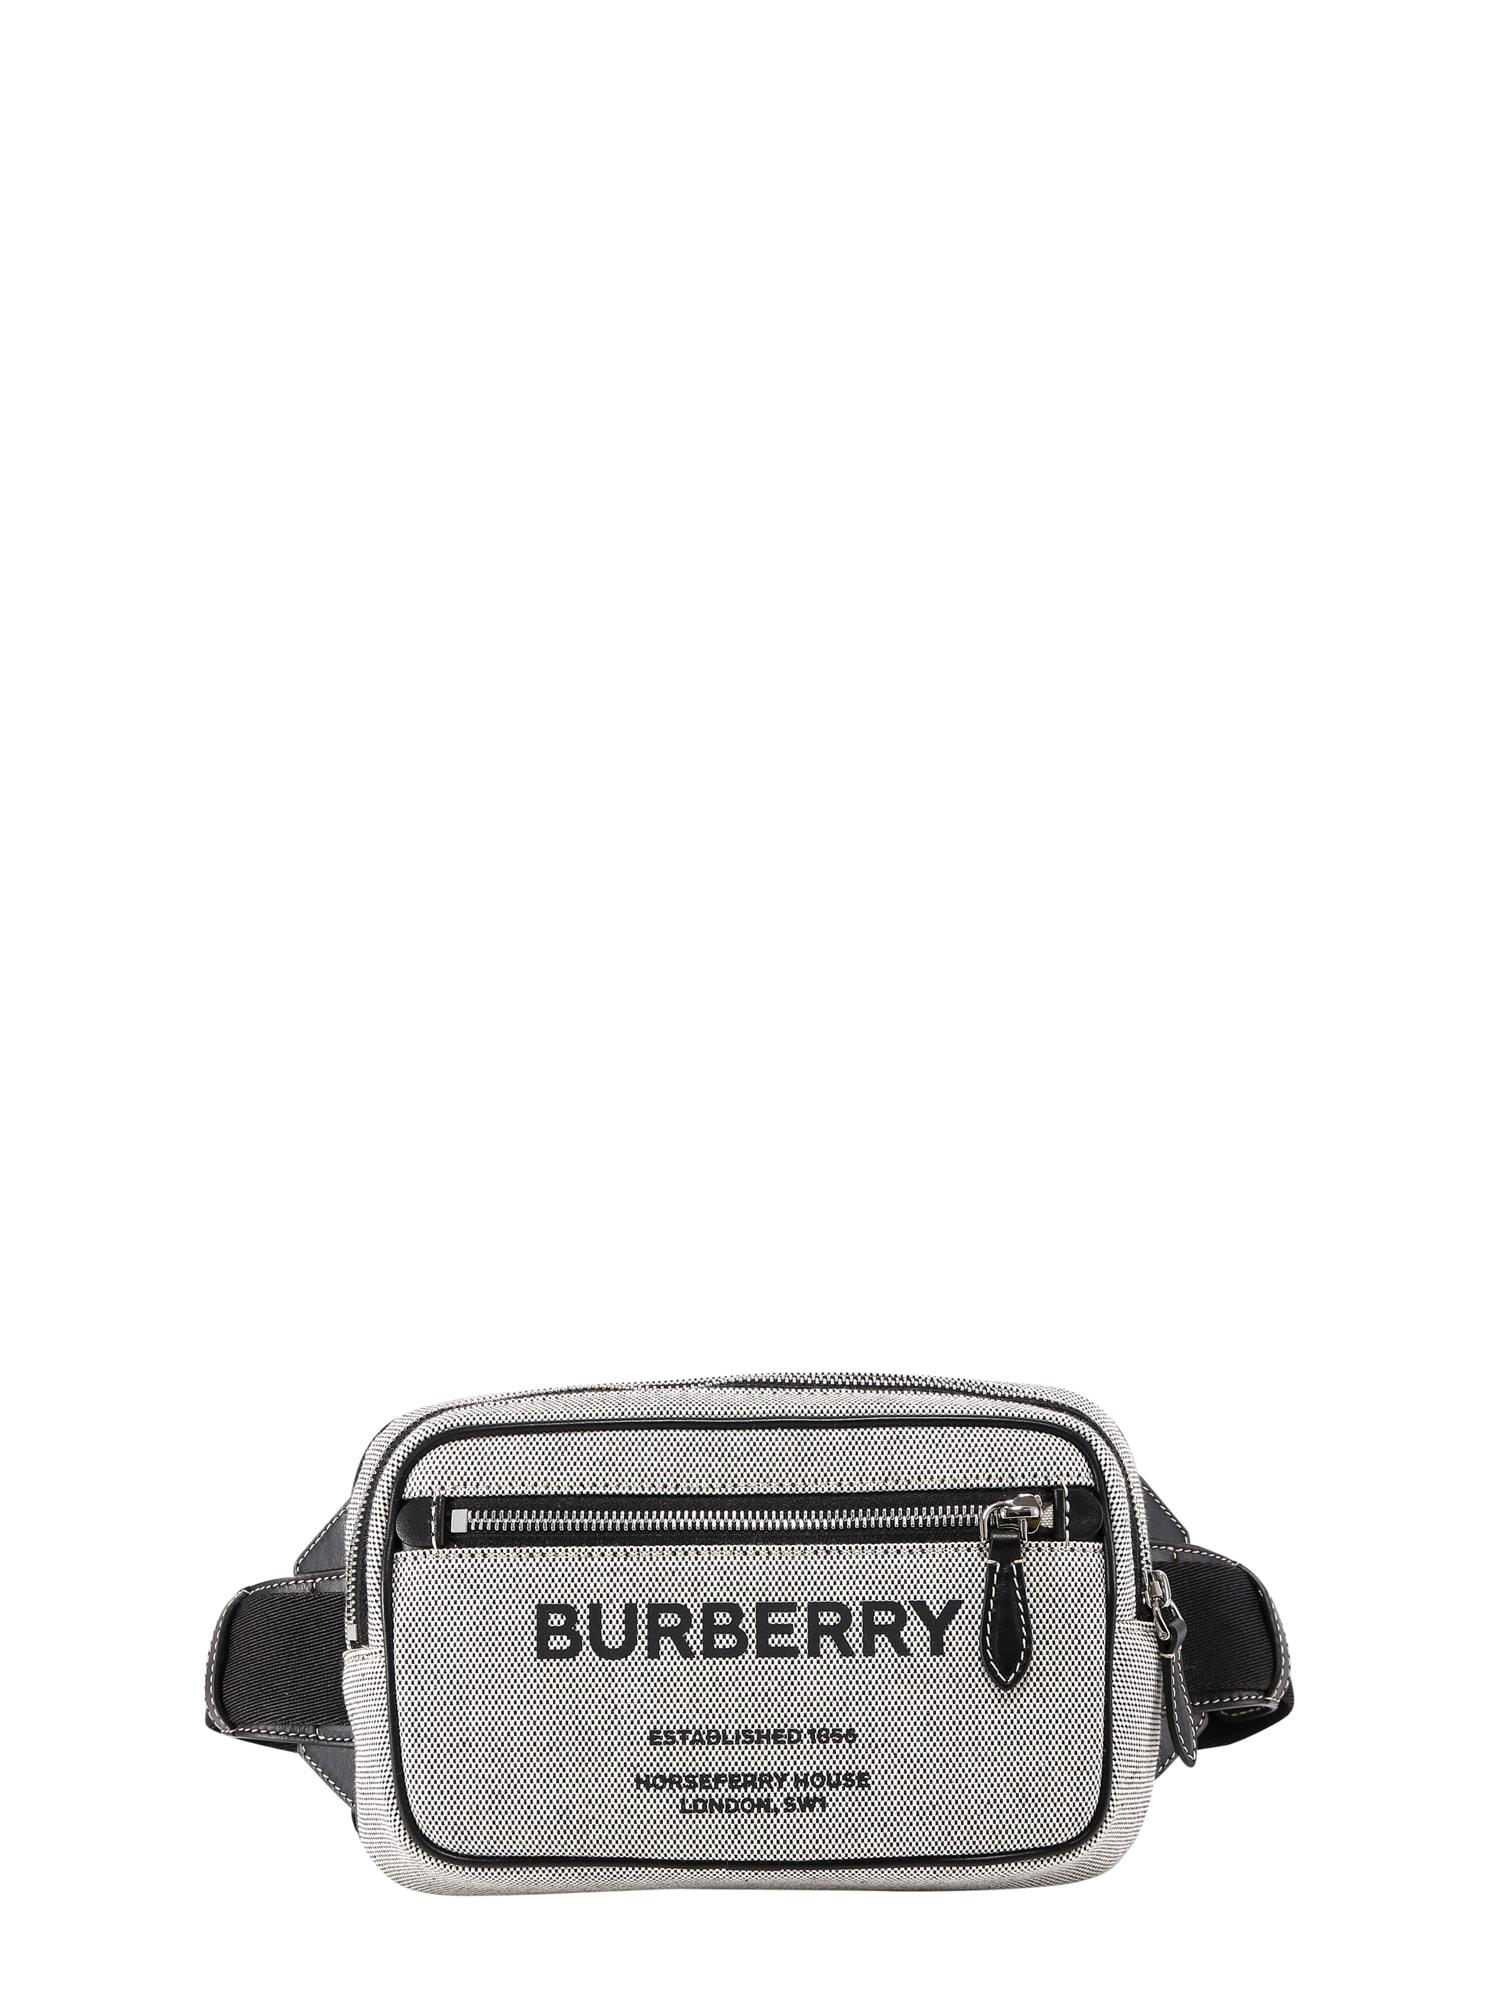 Burberry Leathers BELT BAG